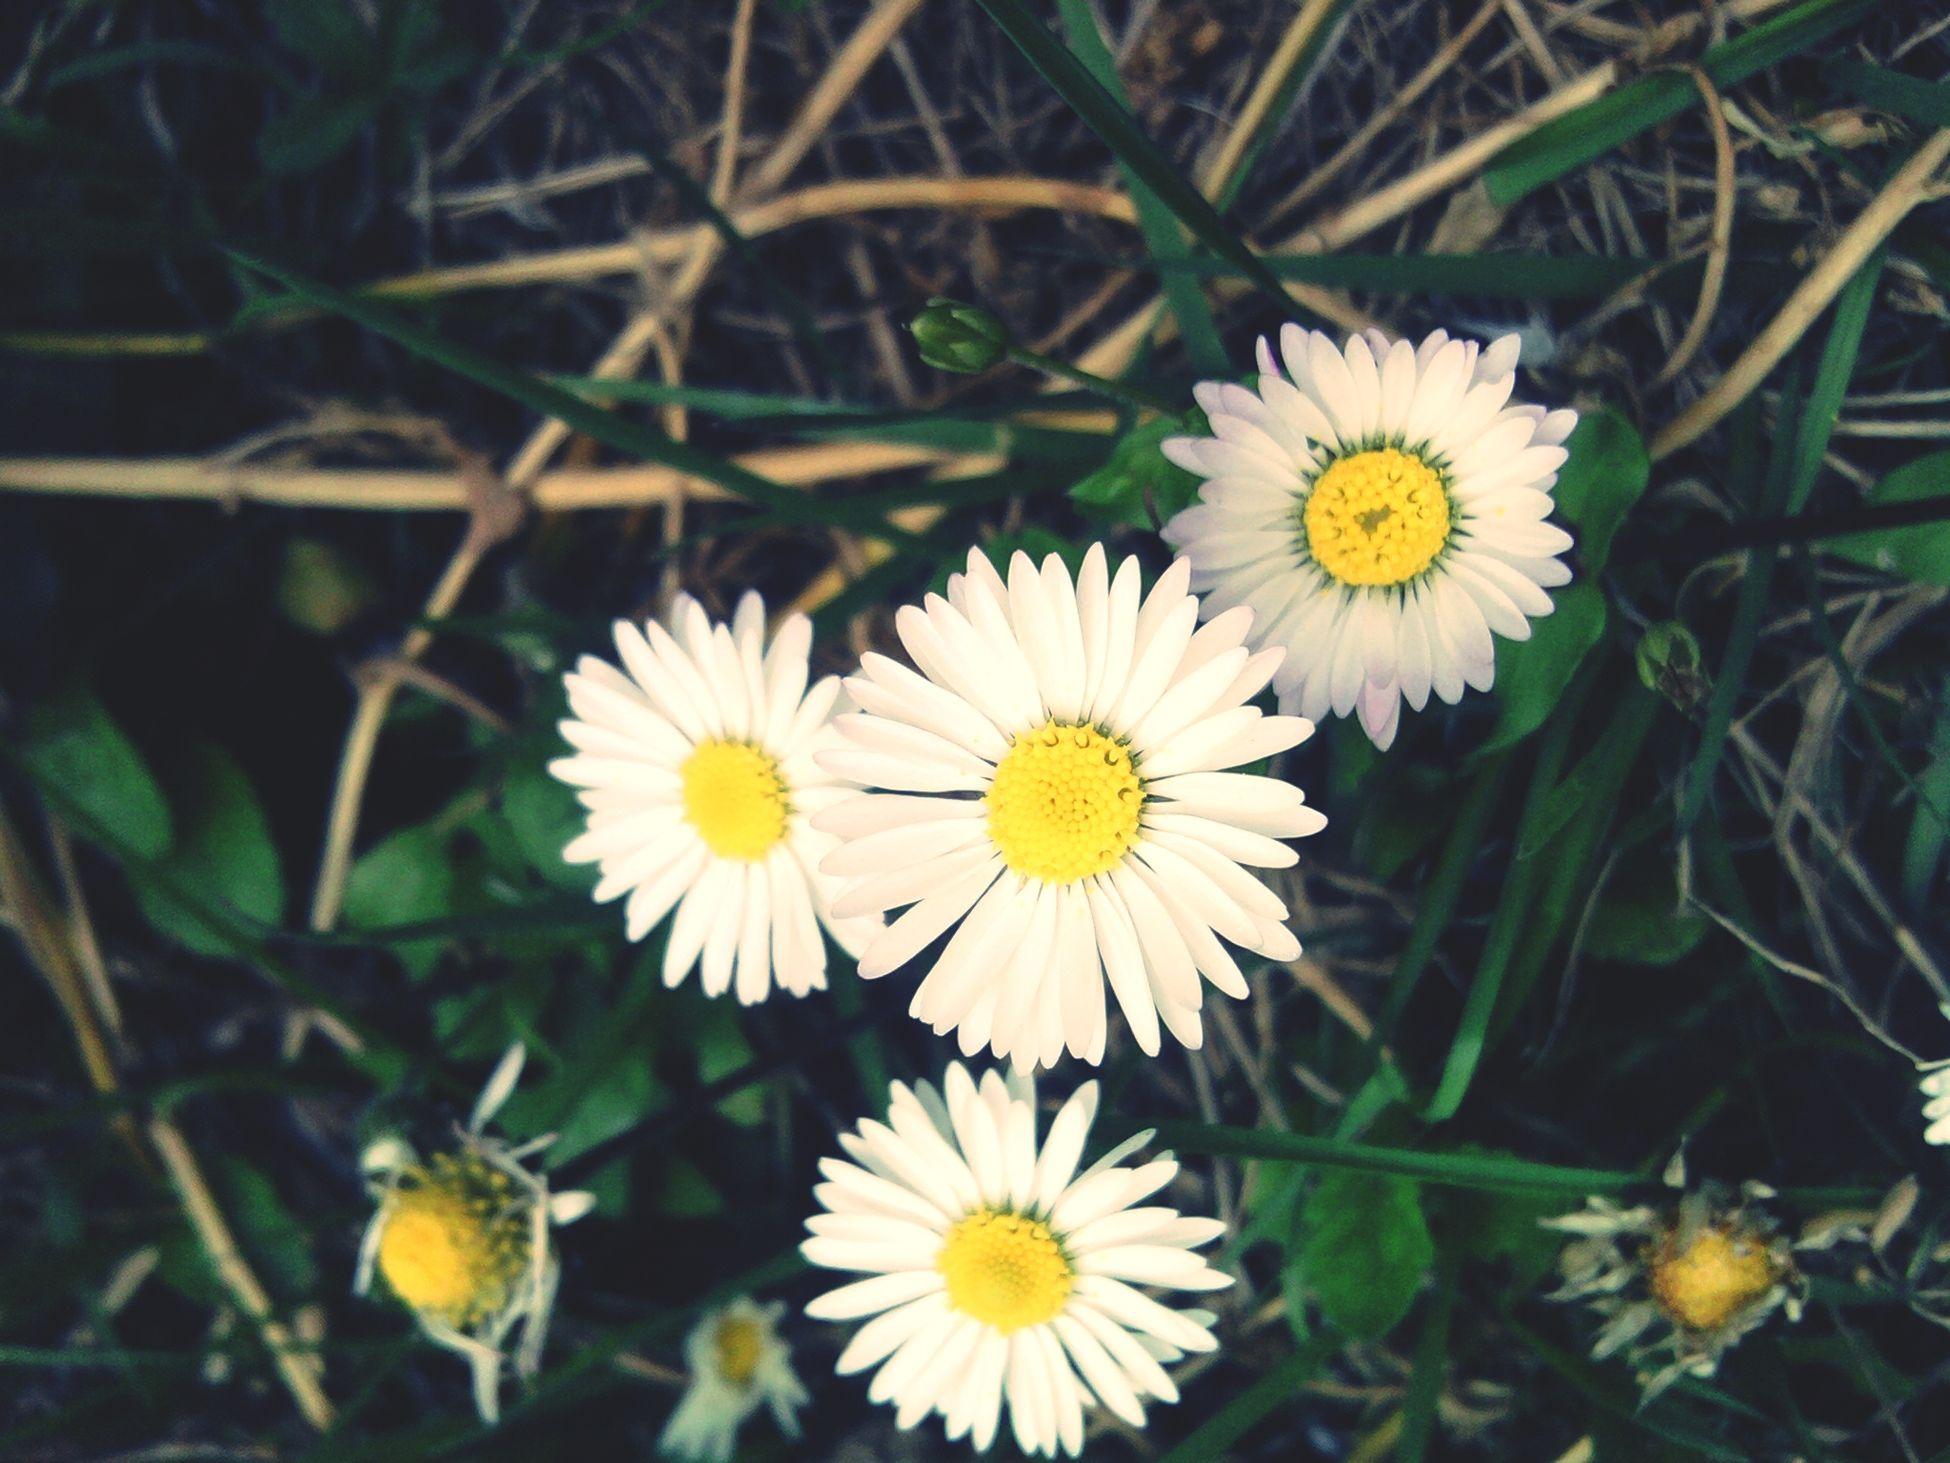 Margherite Flowers M'ama Non M'ama